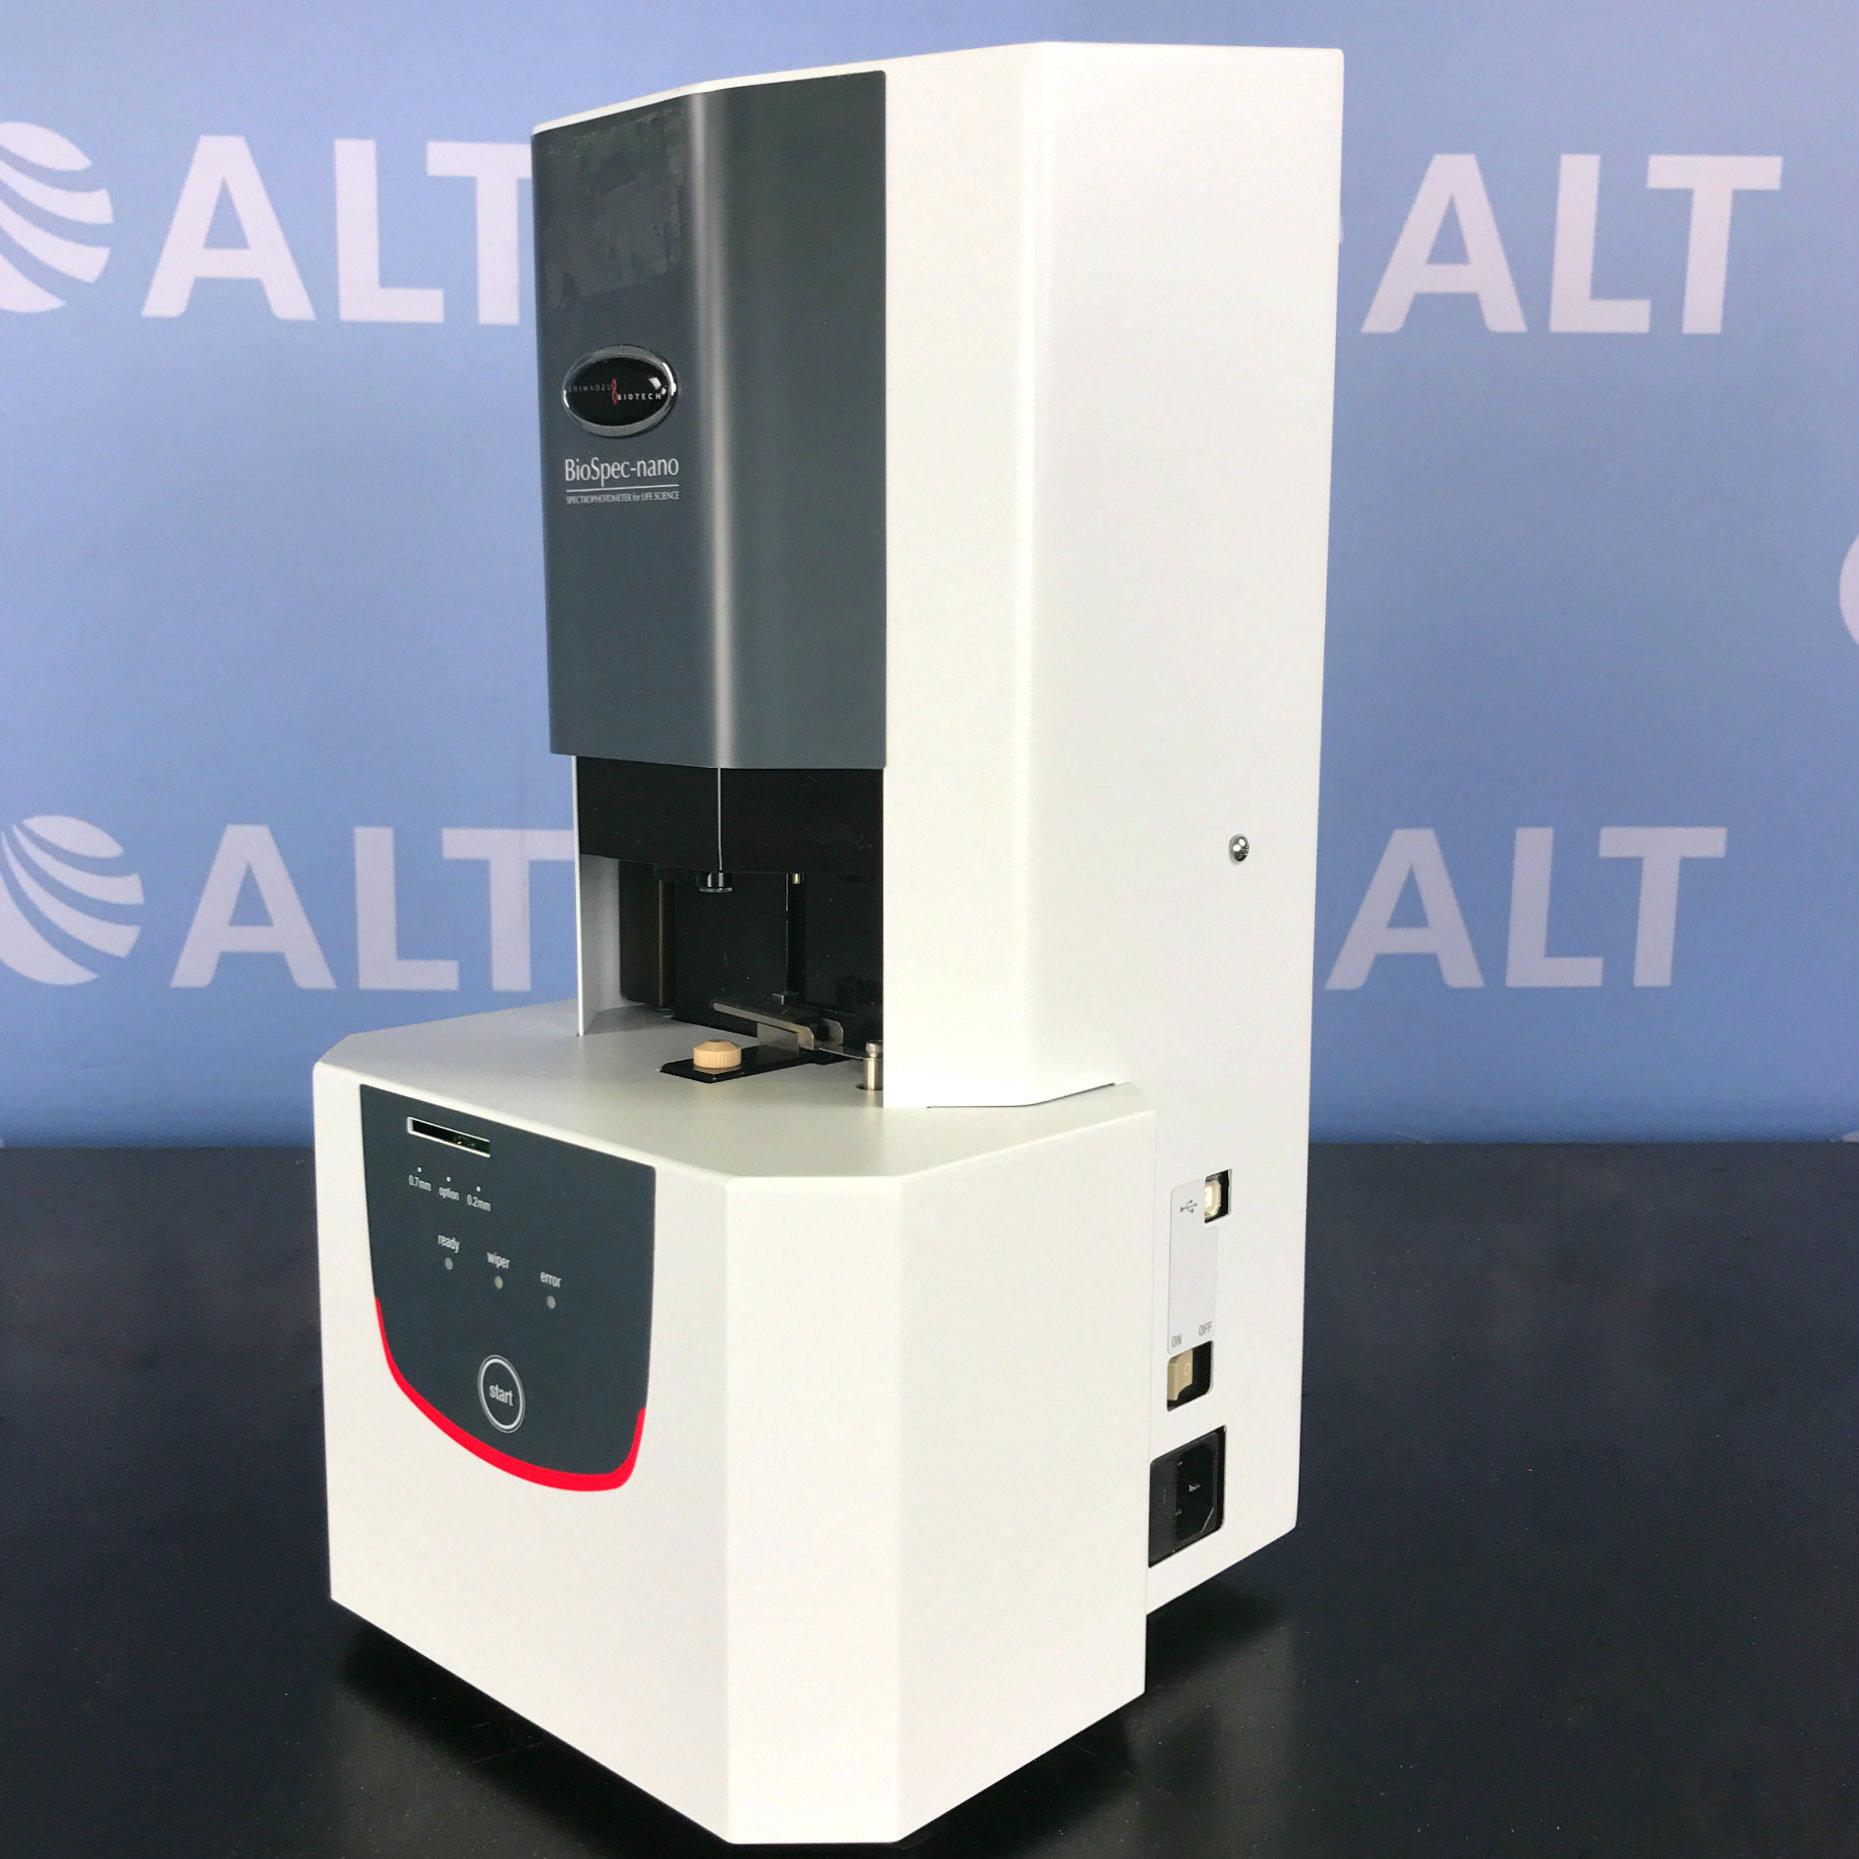 Shimadzu Biospec-Nano Spectrophotometer Image